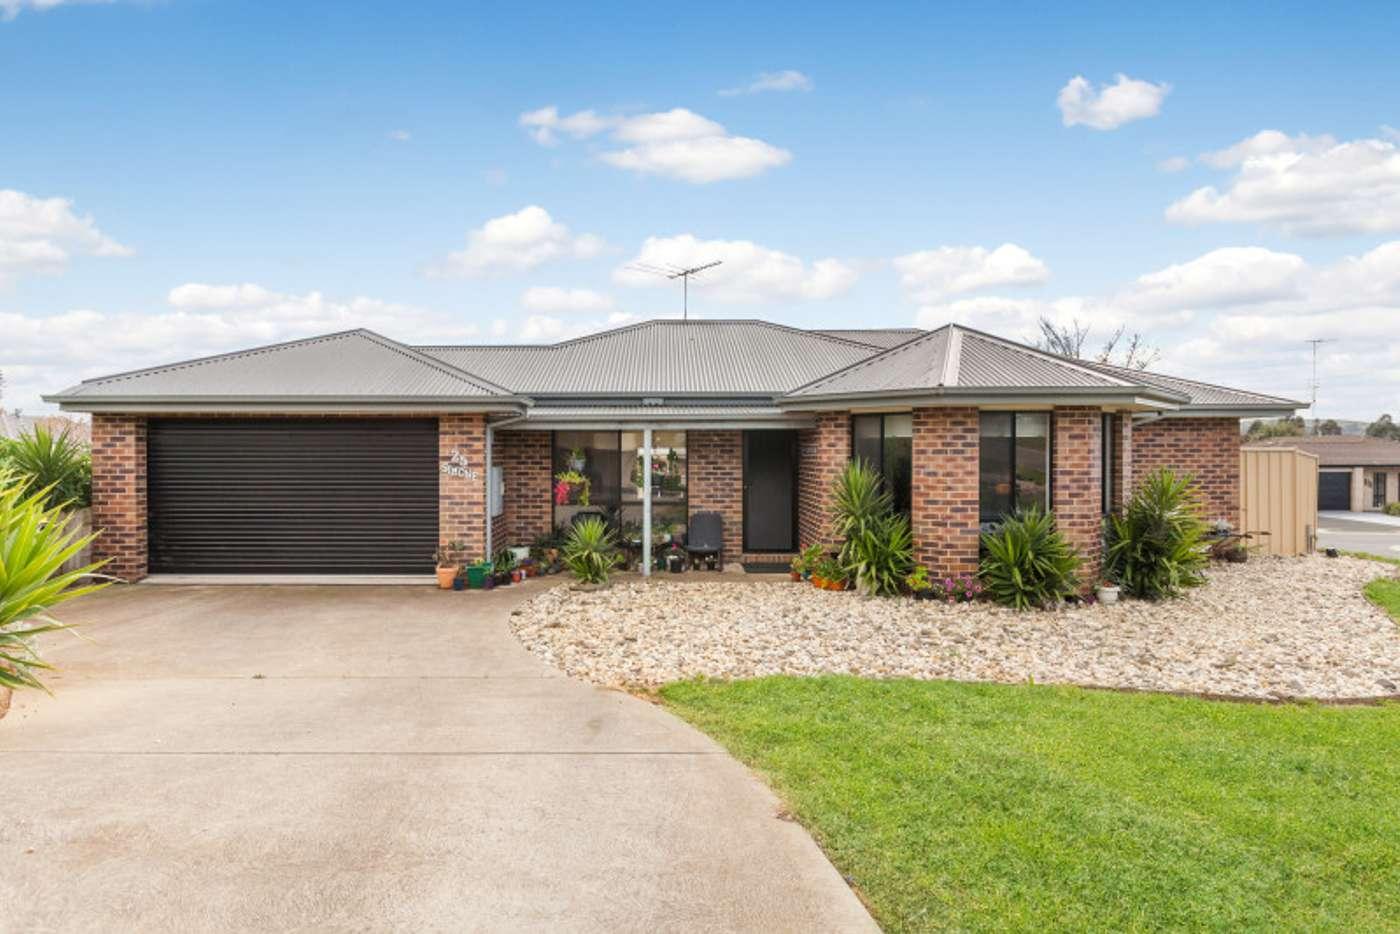 Main view of Homely house listing, 25 Simone Street, Kilmore VIC 3764